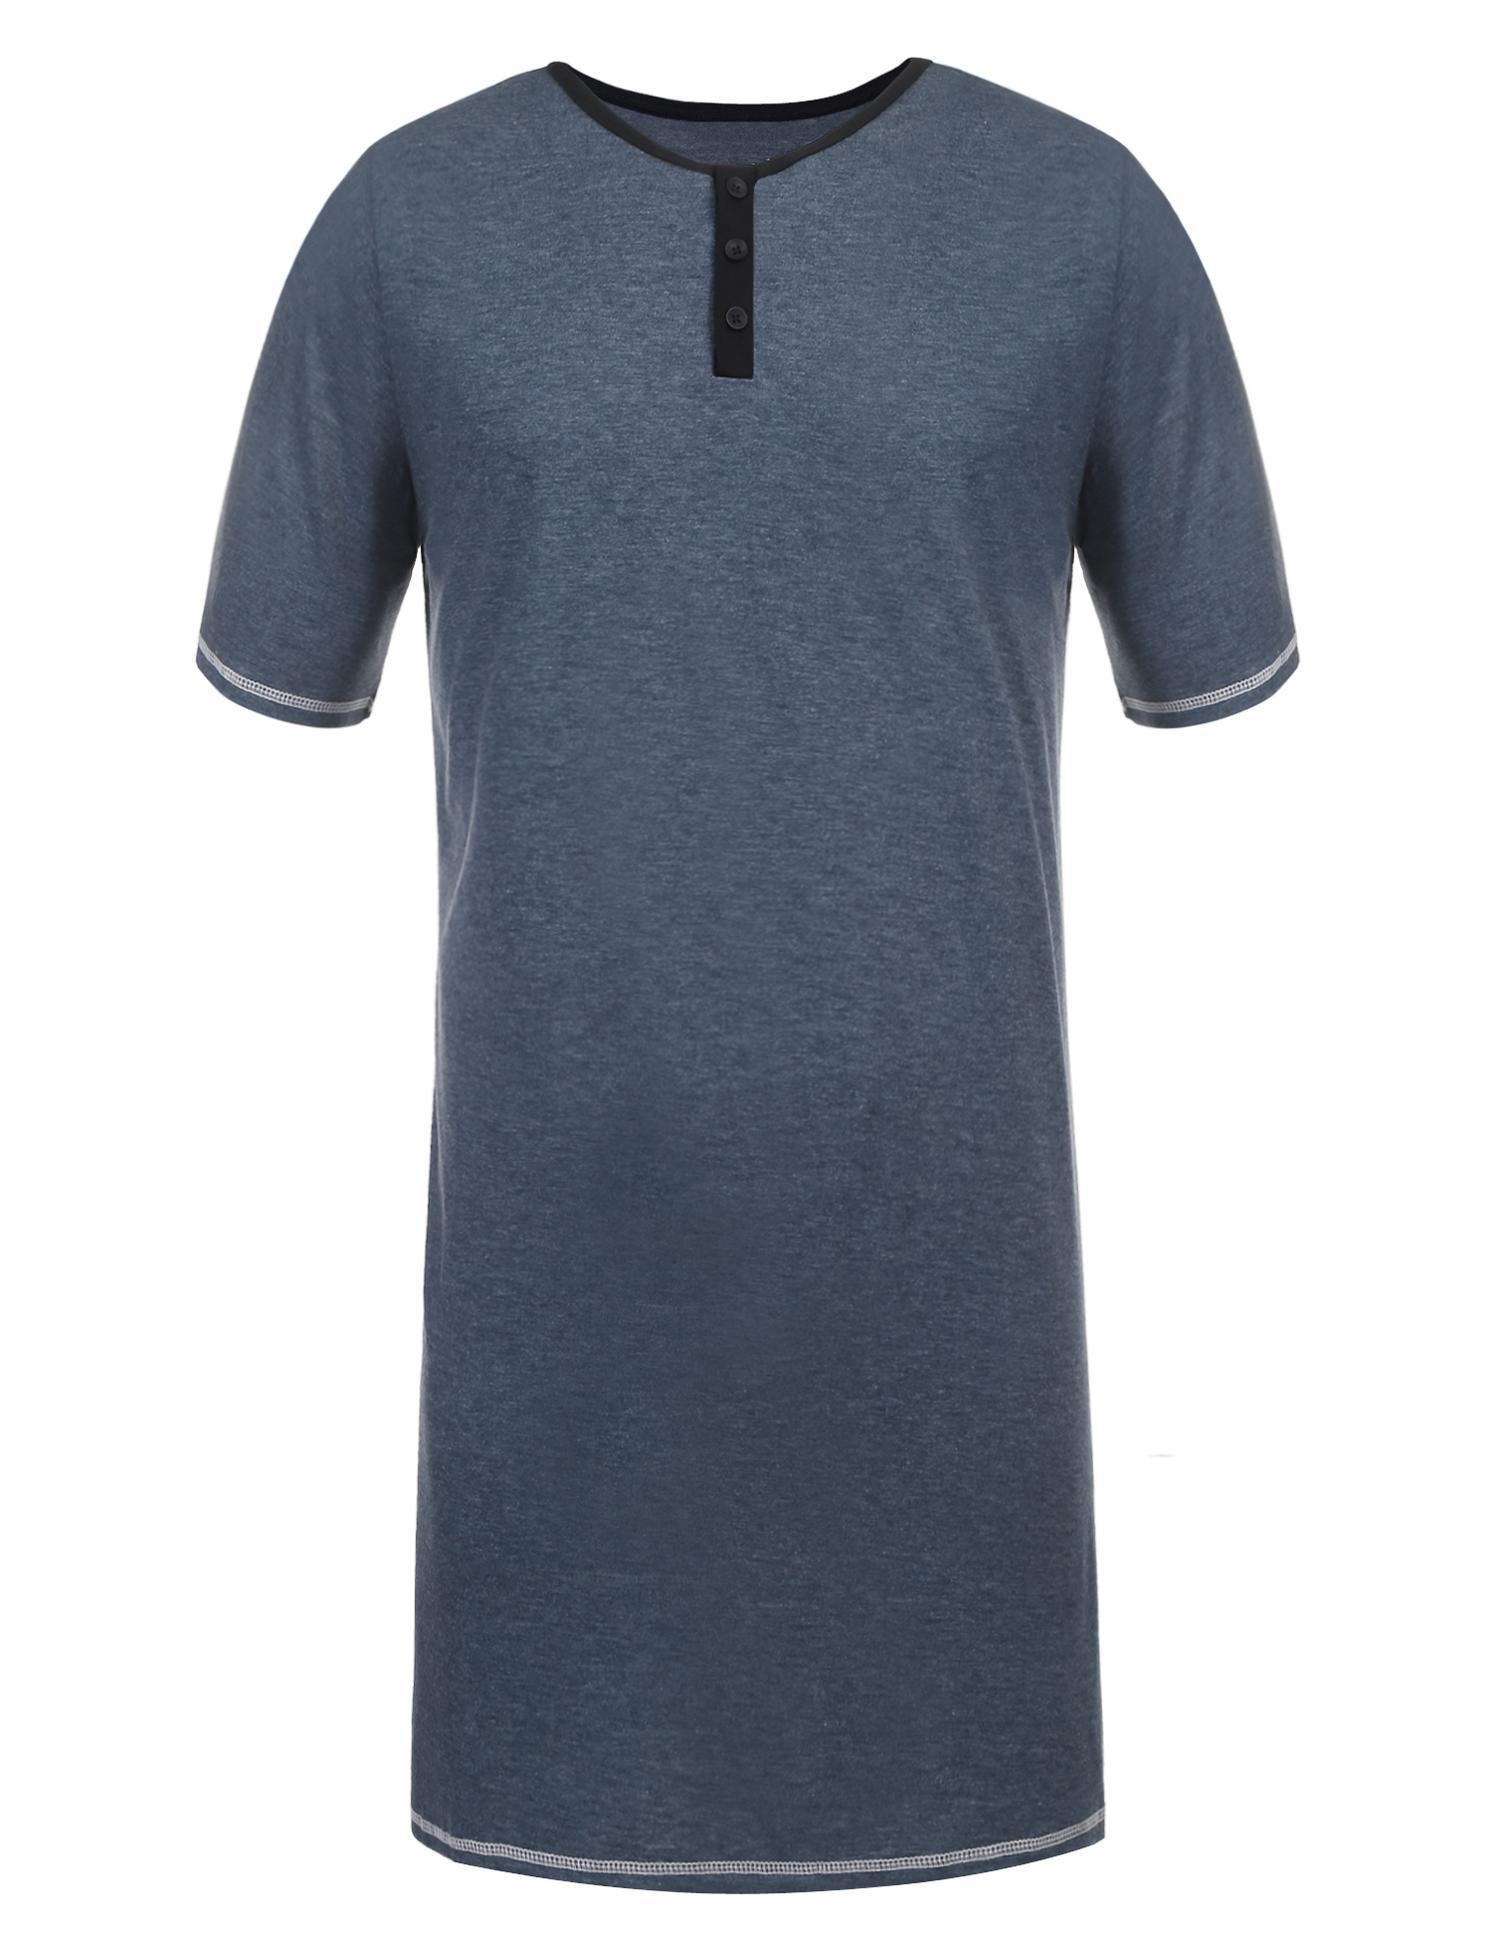 Skylin Nightdress Men's Comfort Sleepwear Short Sleeve Nightshirt Sleep Shirt (Dark Blue, XXL)